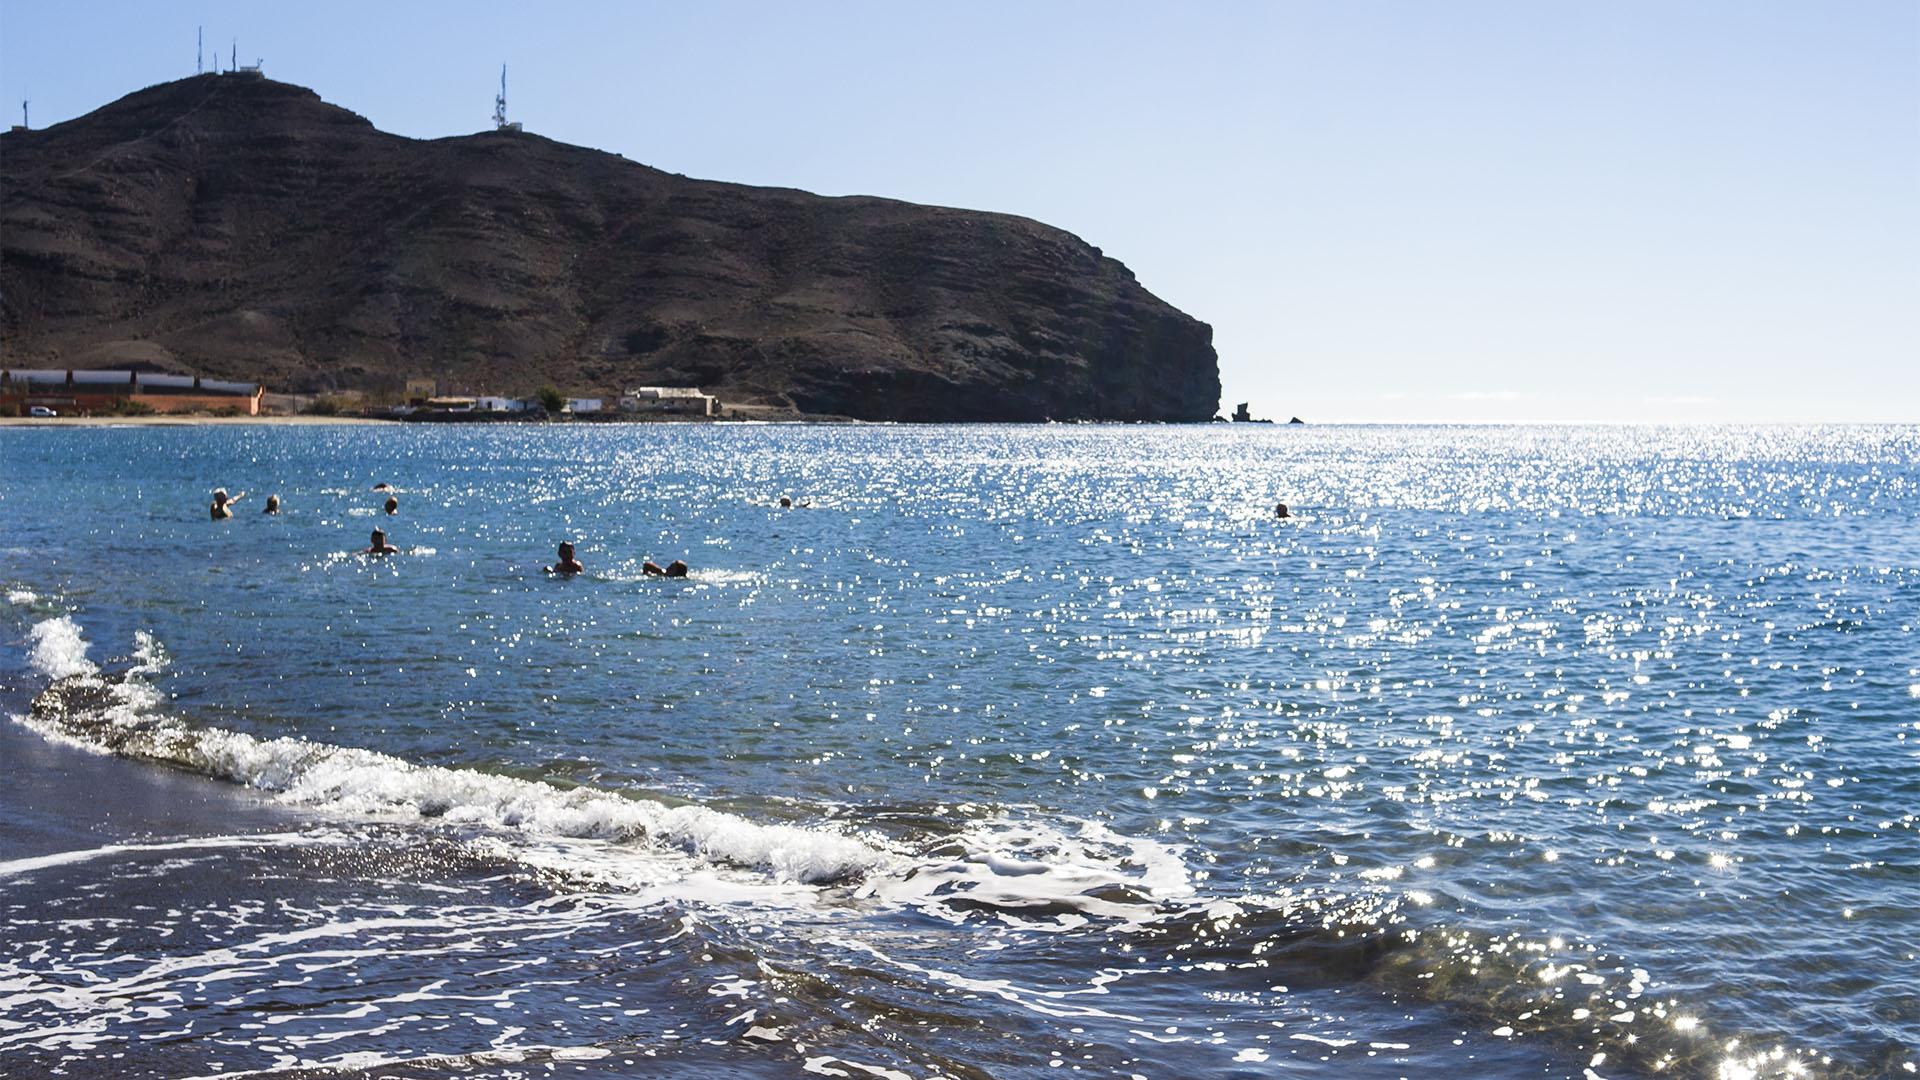 Die Strände Fuerteventuras: Playa de Gran Tarajal.